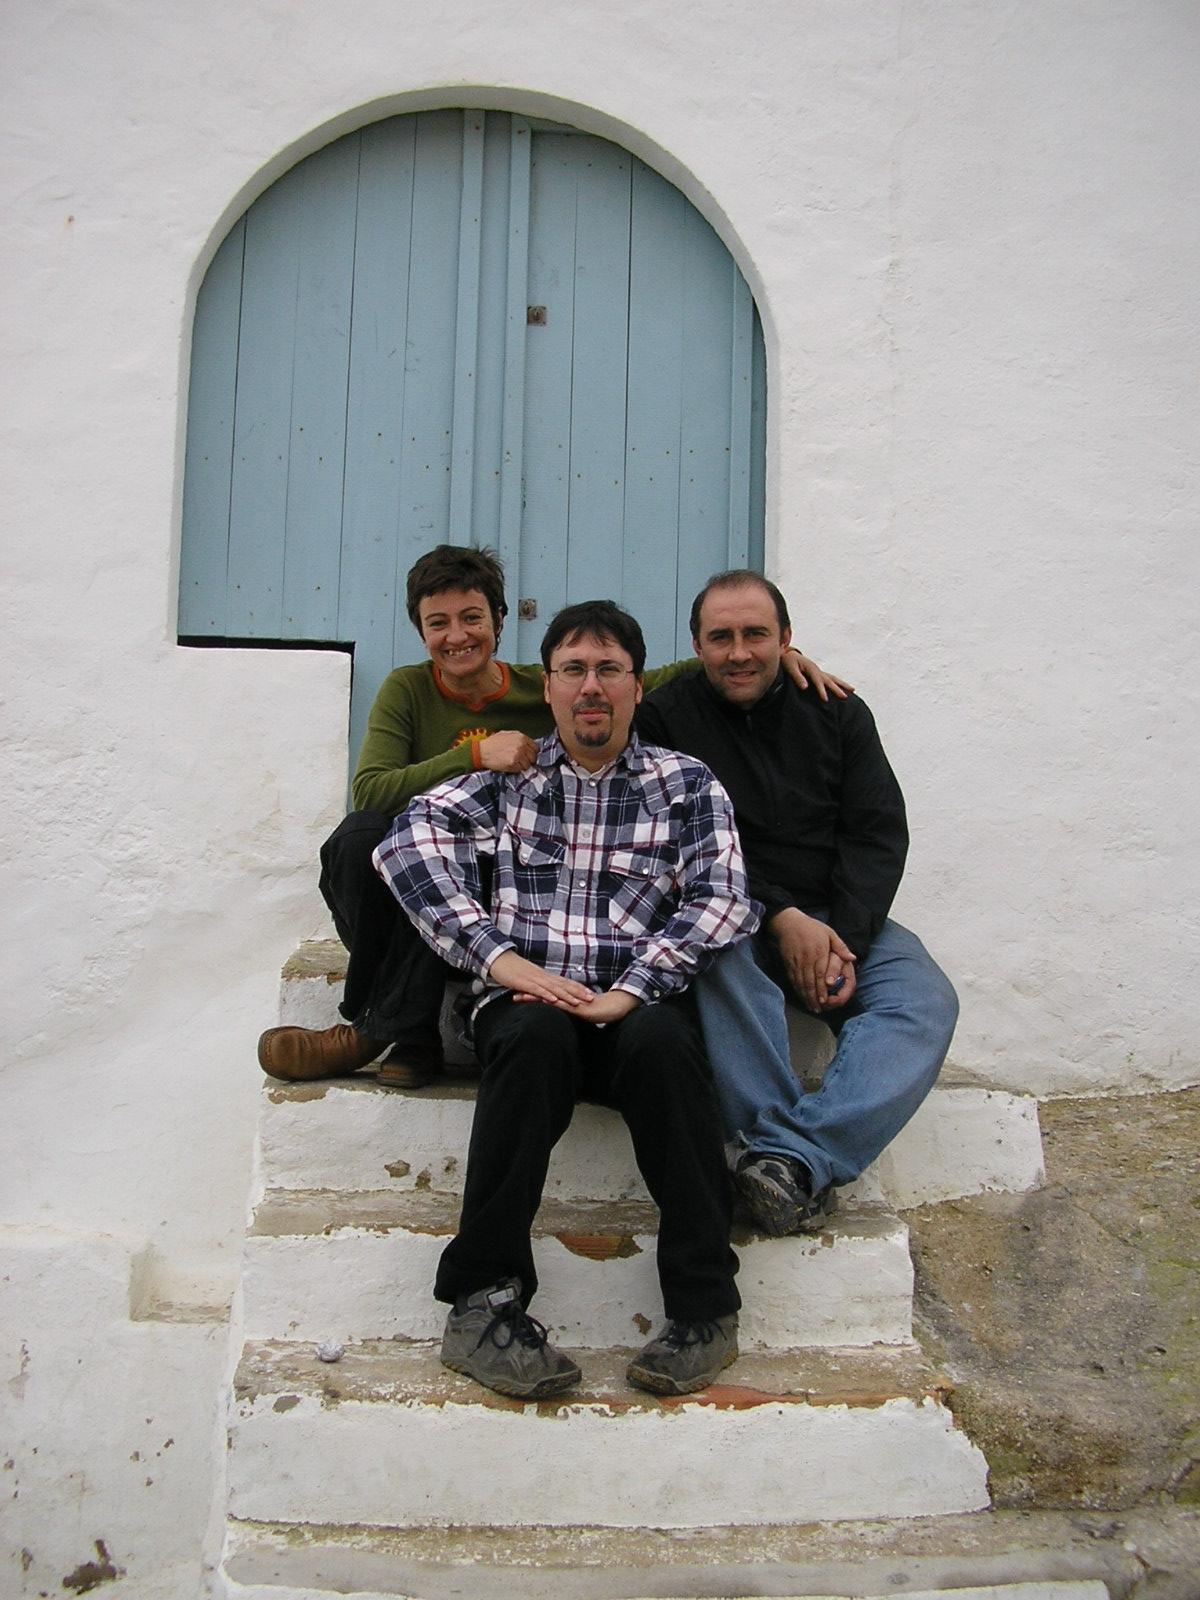 Shooting LA HORA FRIA, with production director Carmen Sánchez and production manager Juan Lorenzo Prada